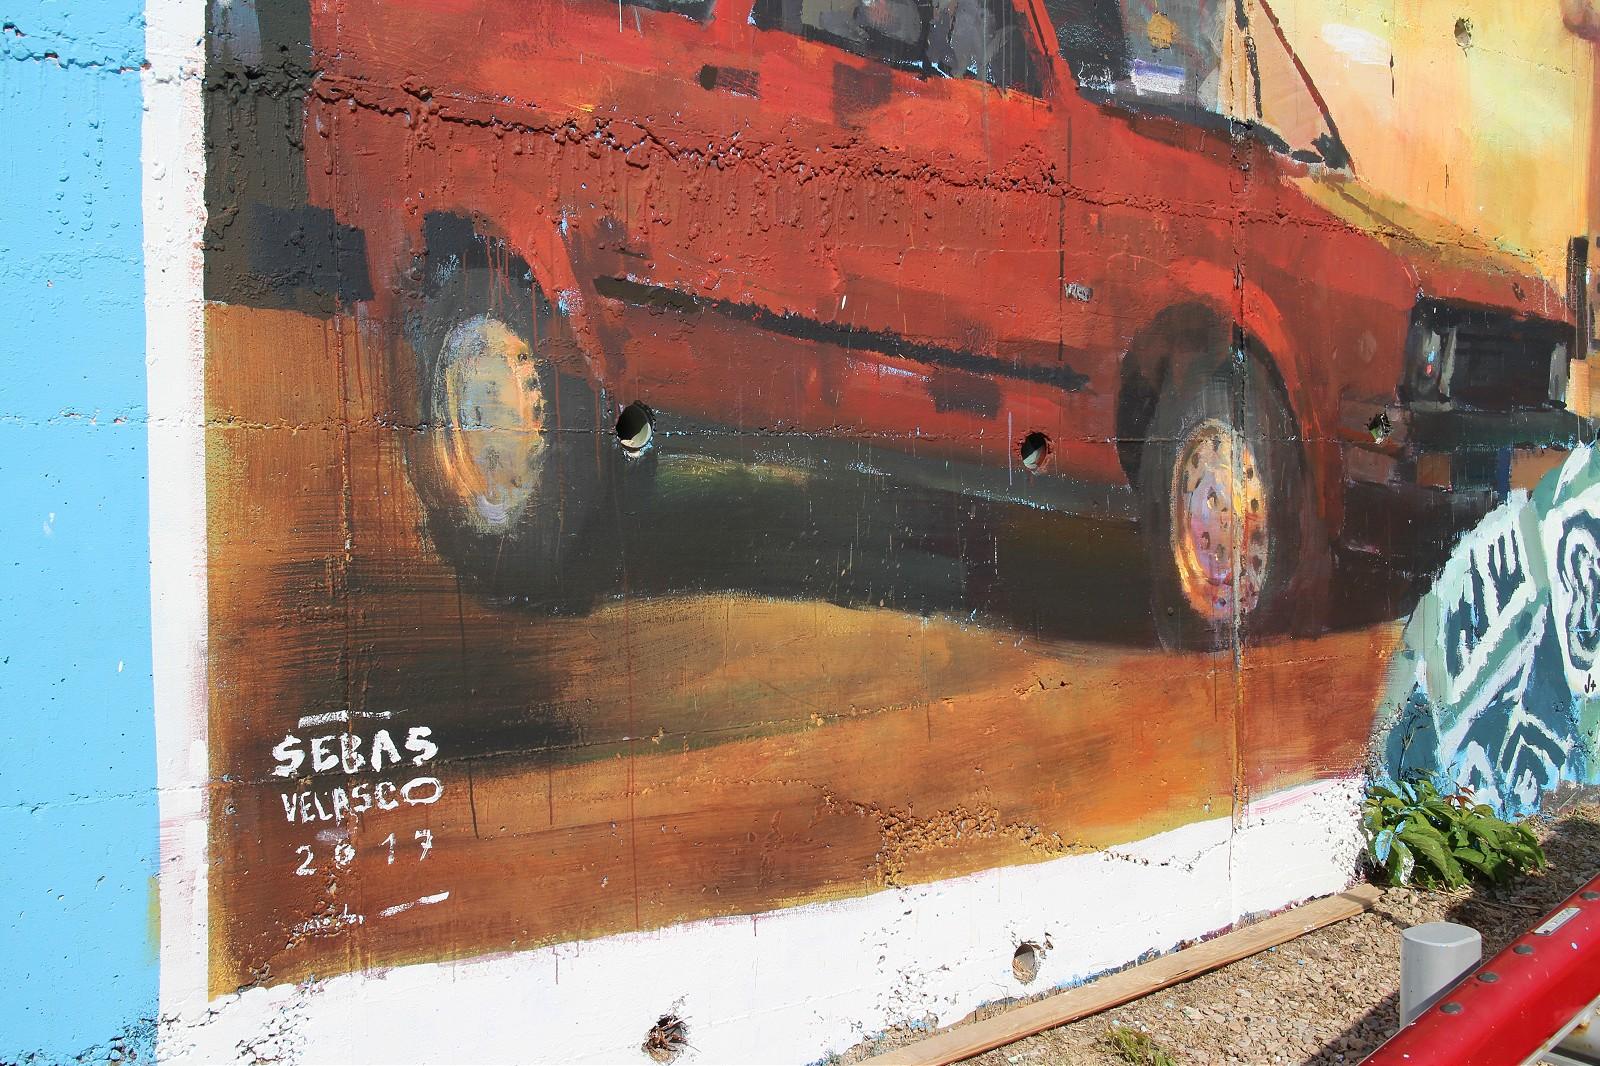 Streets: Sebas Velasco x Inigo Sesma, Bol (Croatia)